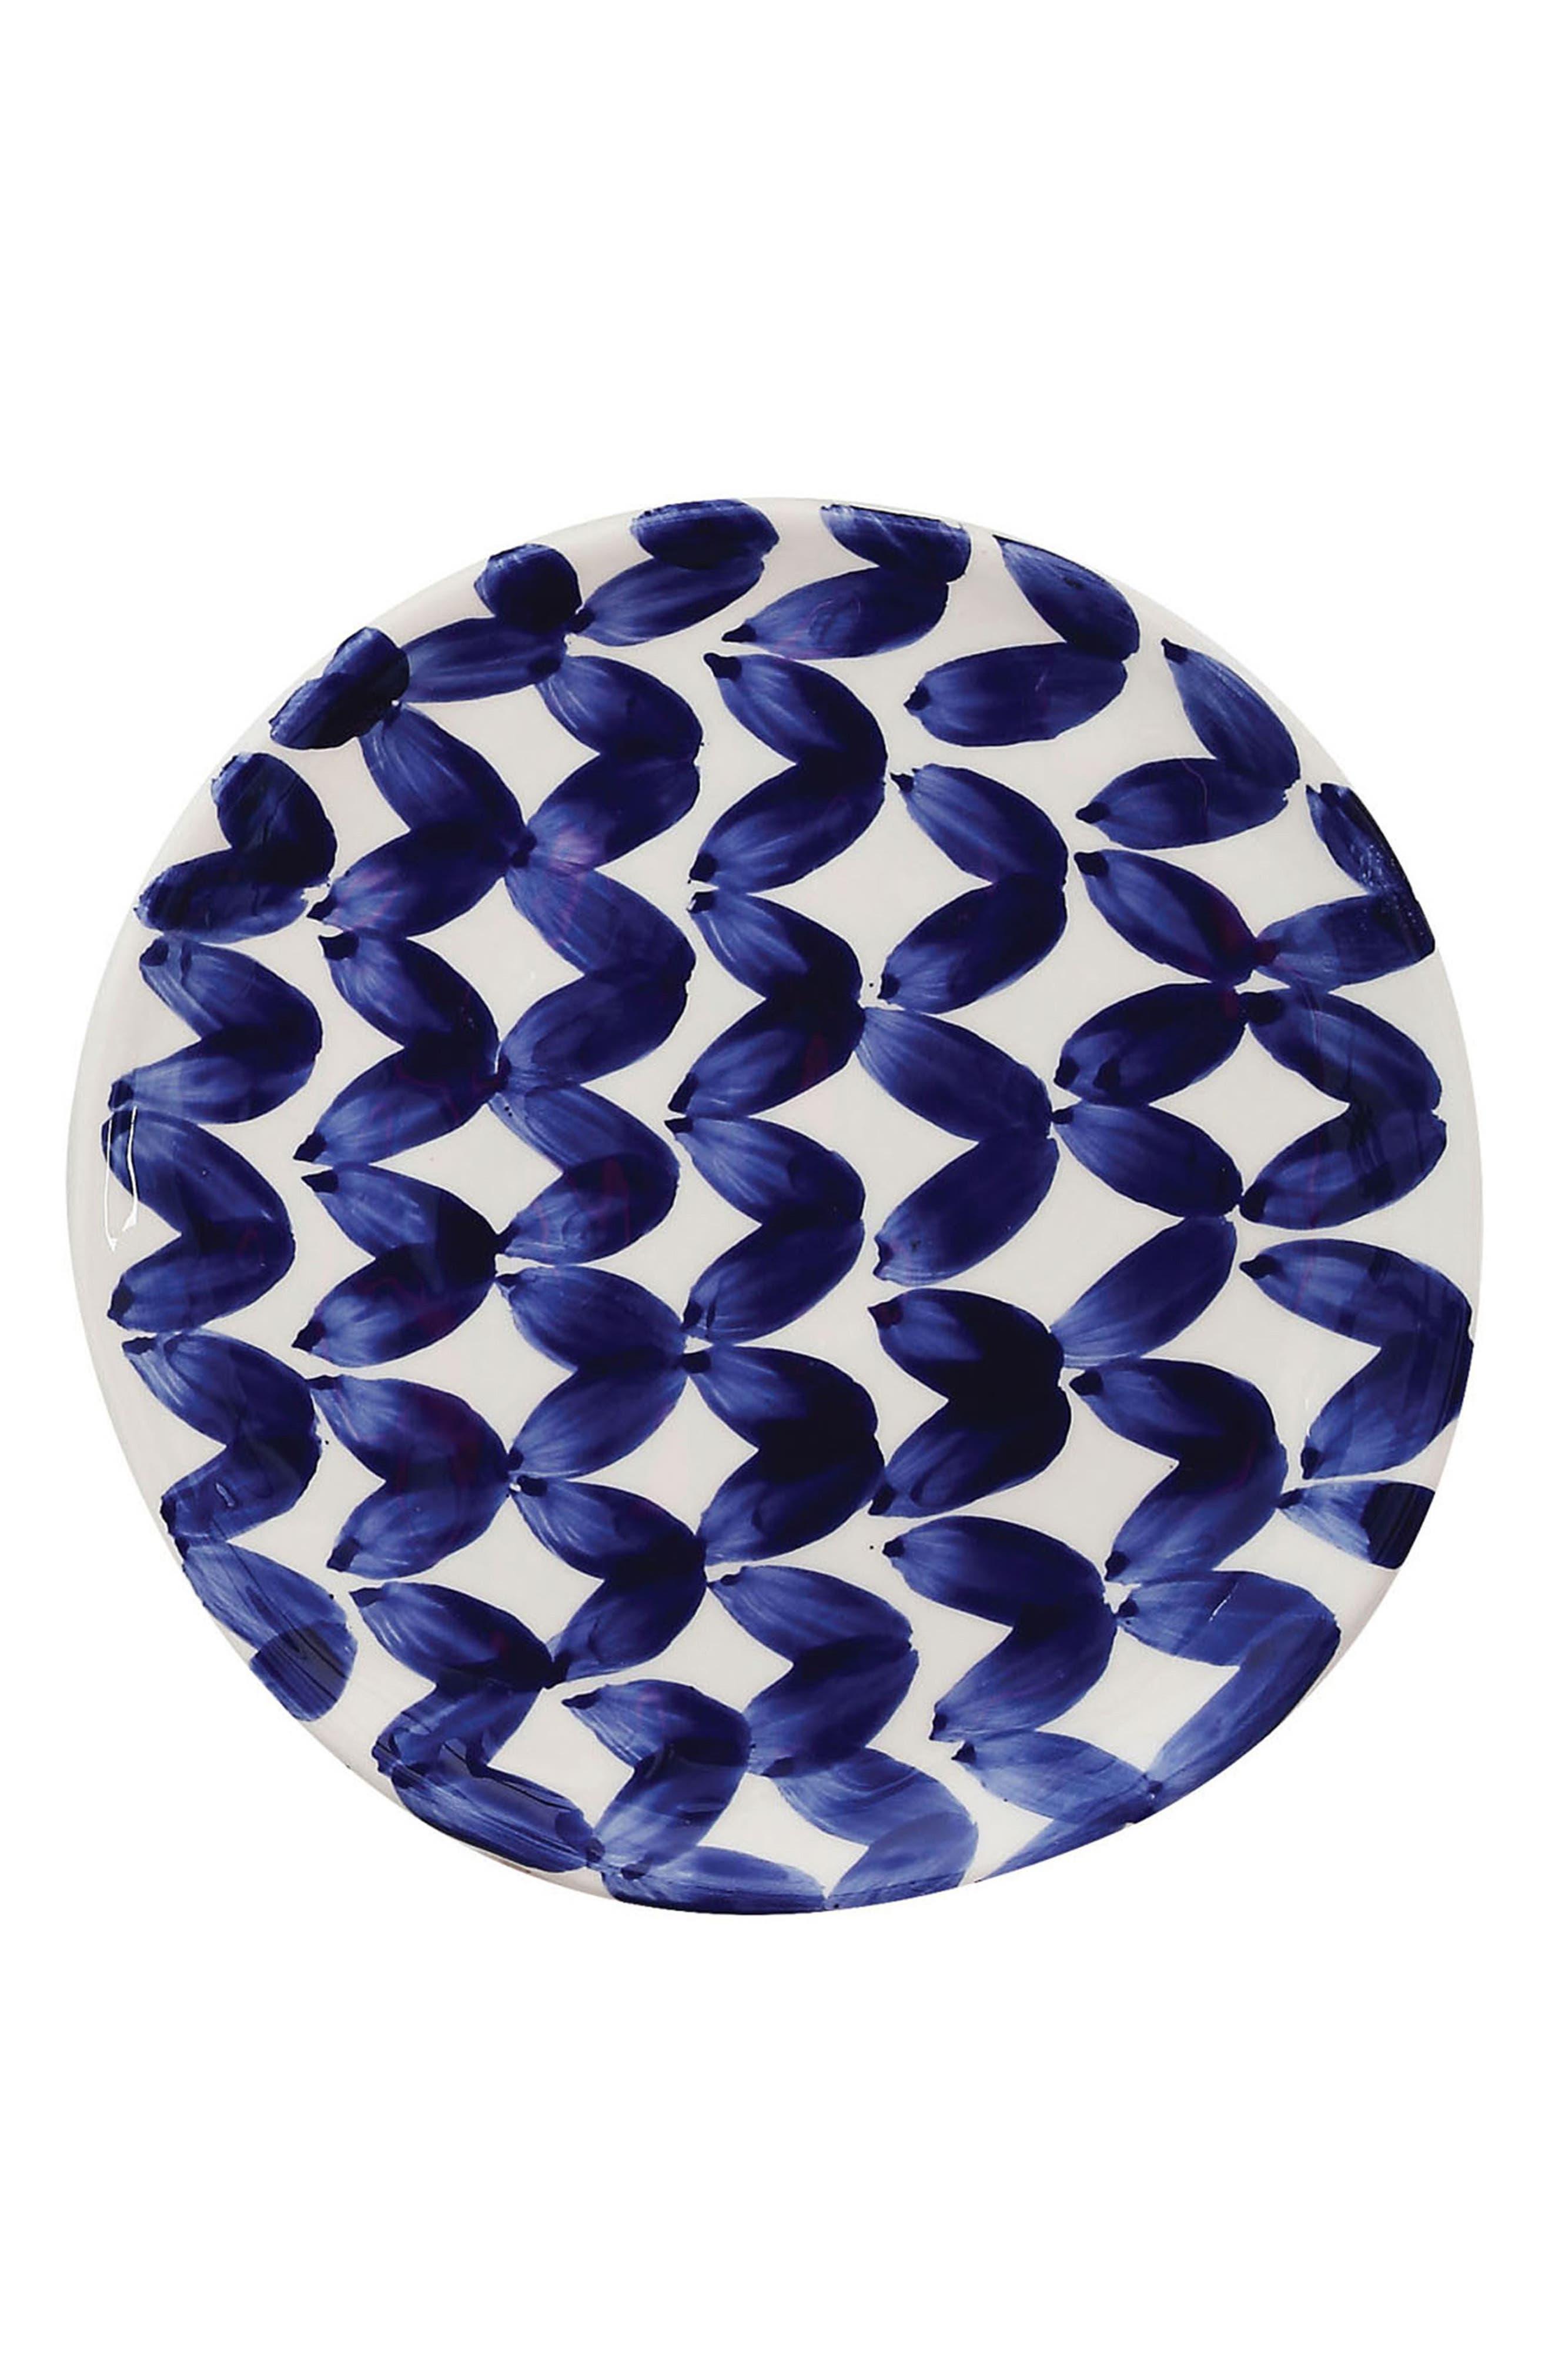 Blue & White Plate,                             Main thumbnail 1, color,                             Blue